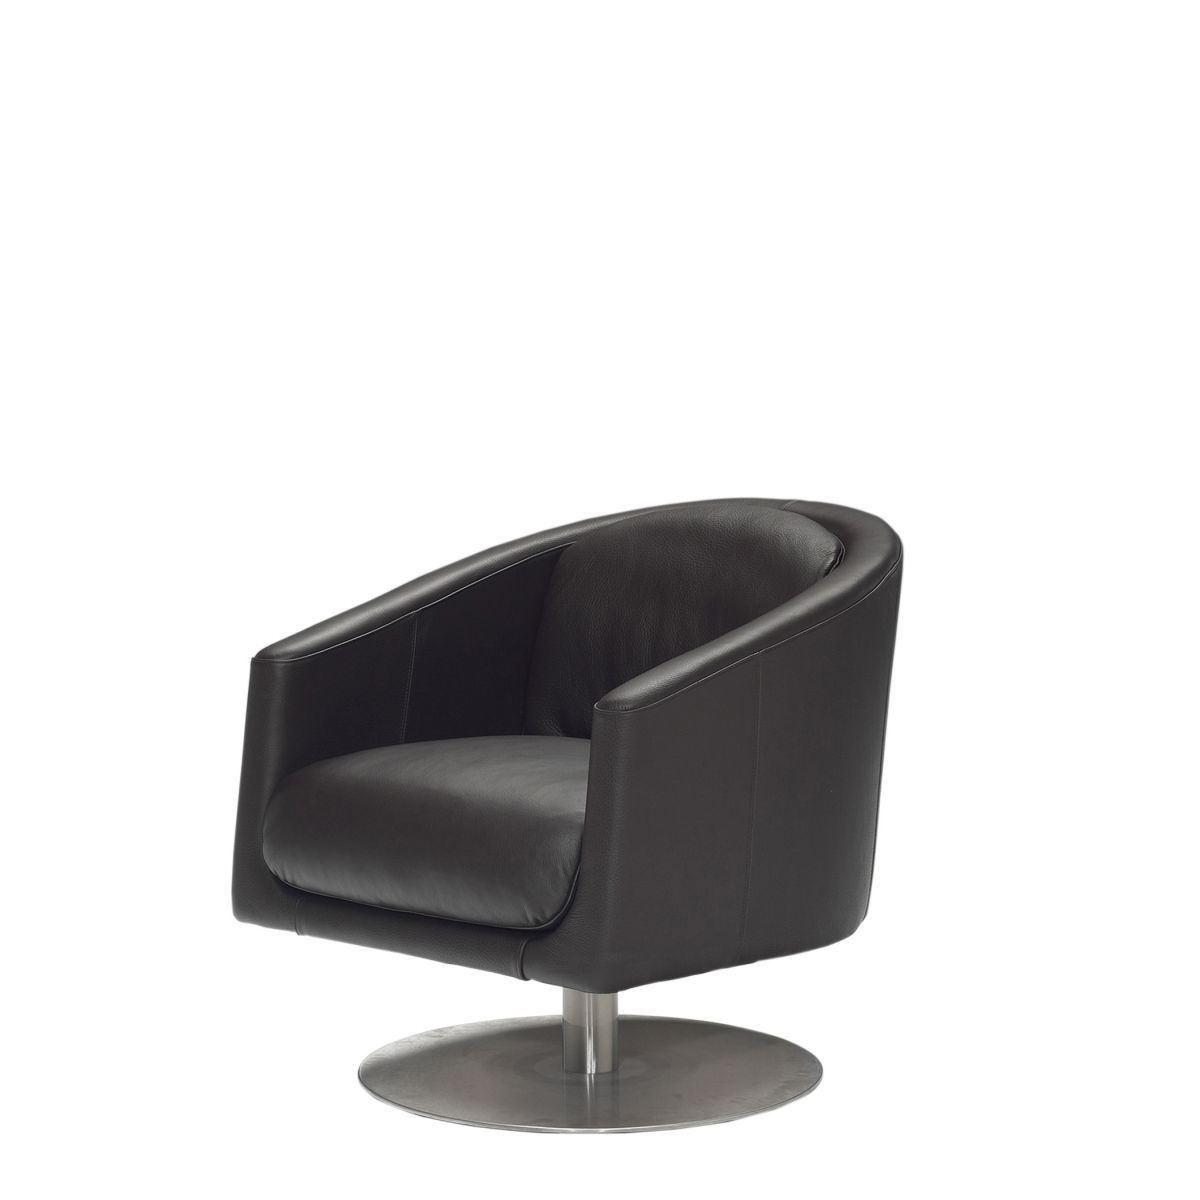 swivel chair vancouver lounge target liu arm inspiration furniture bc